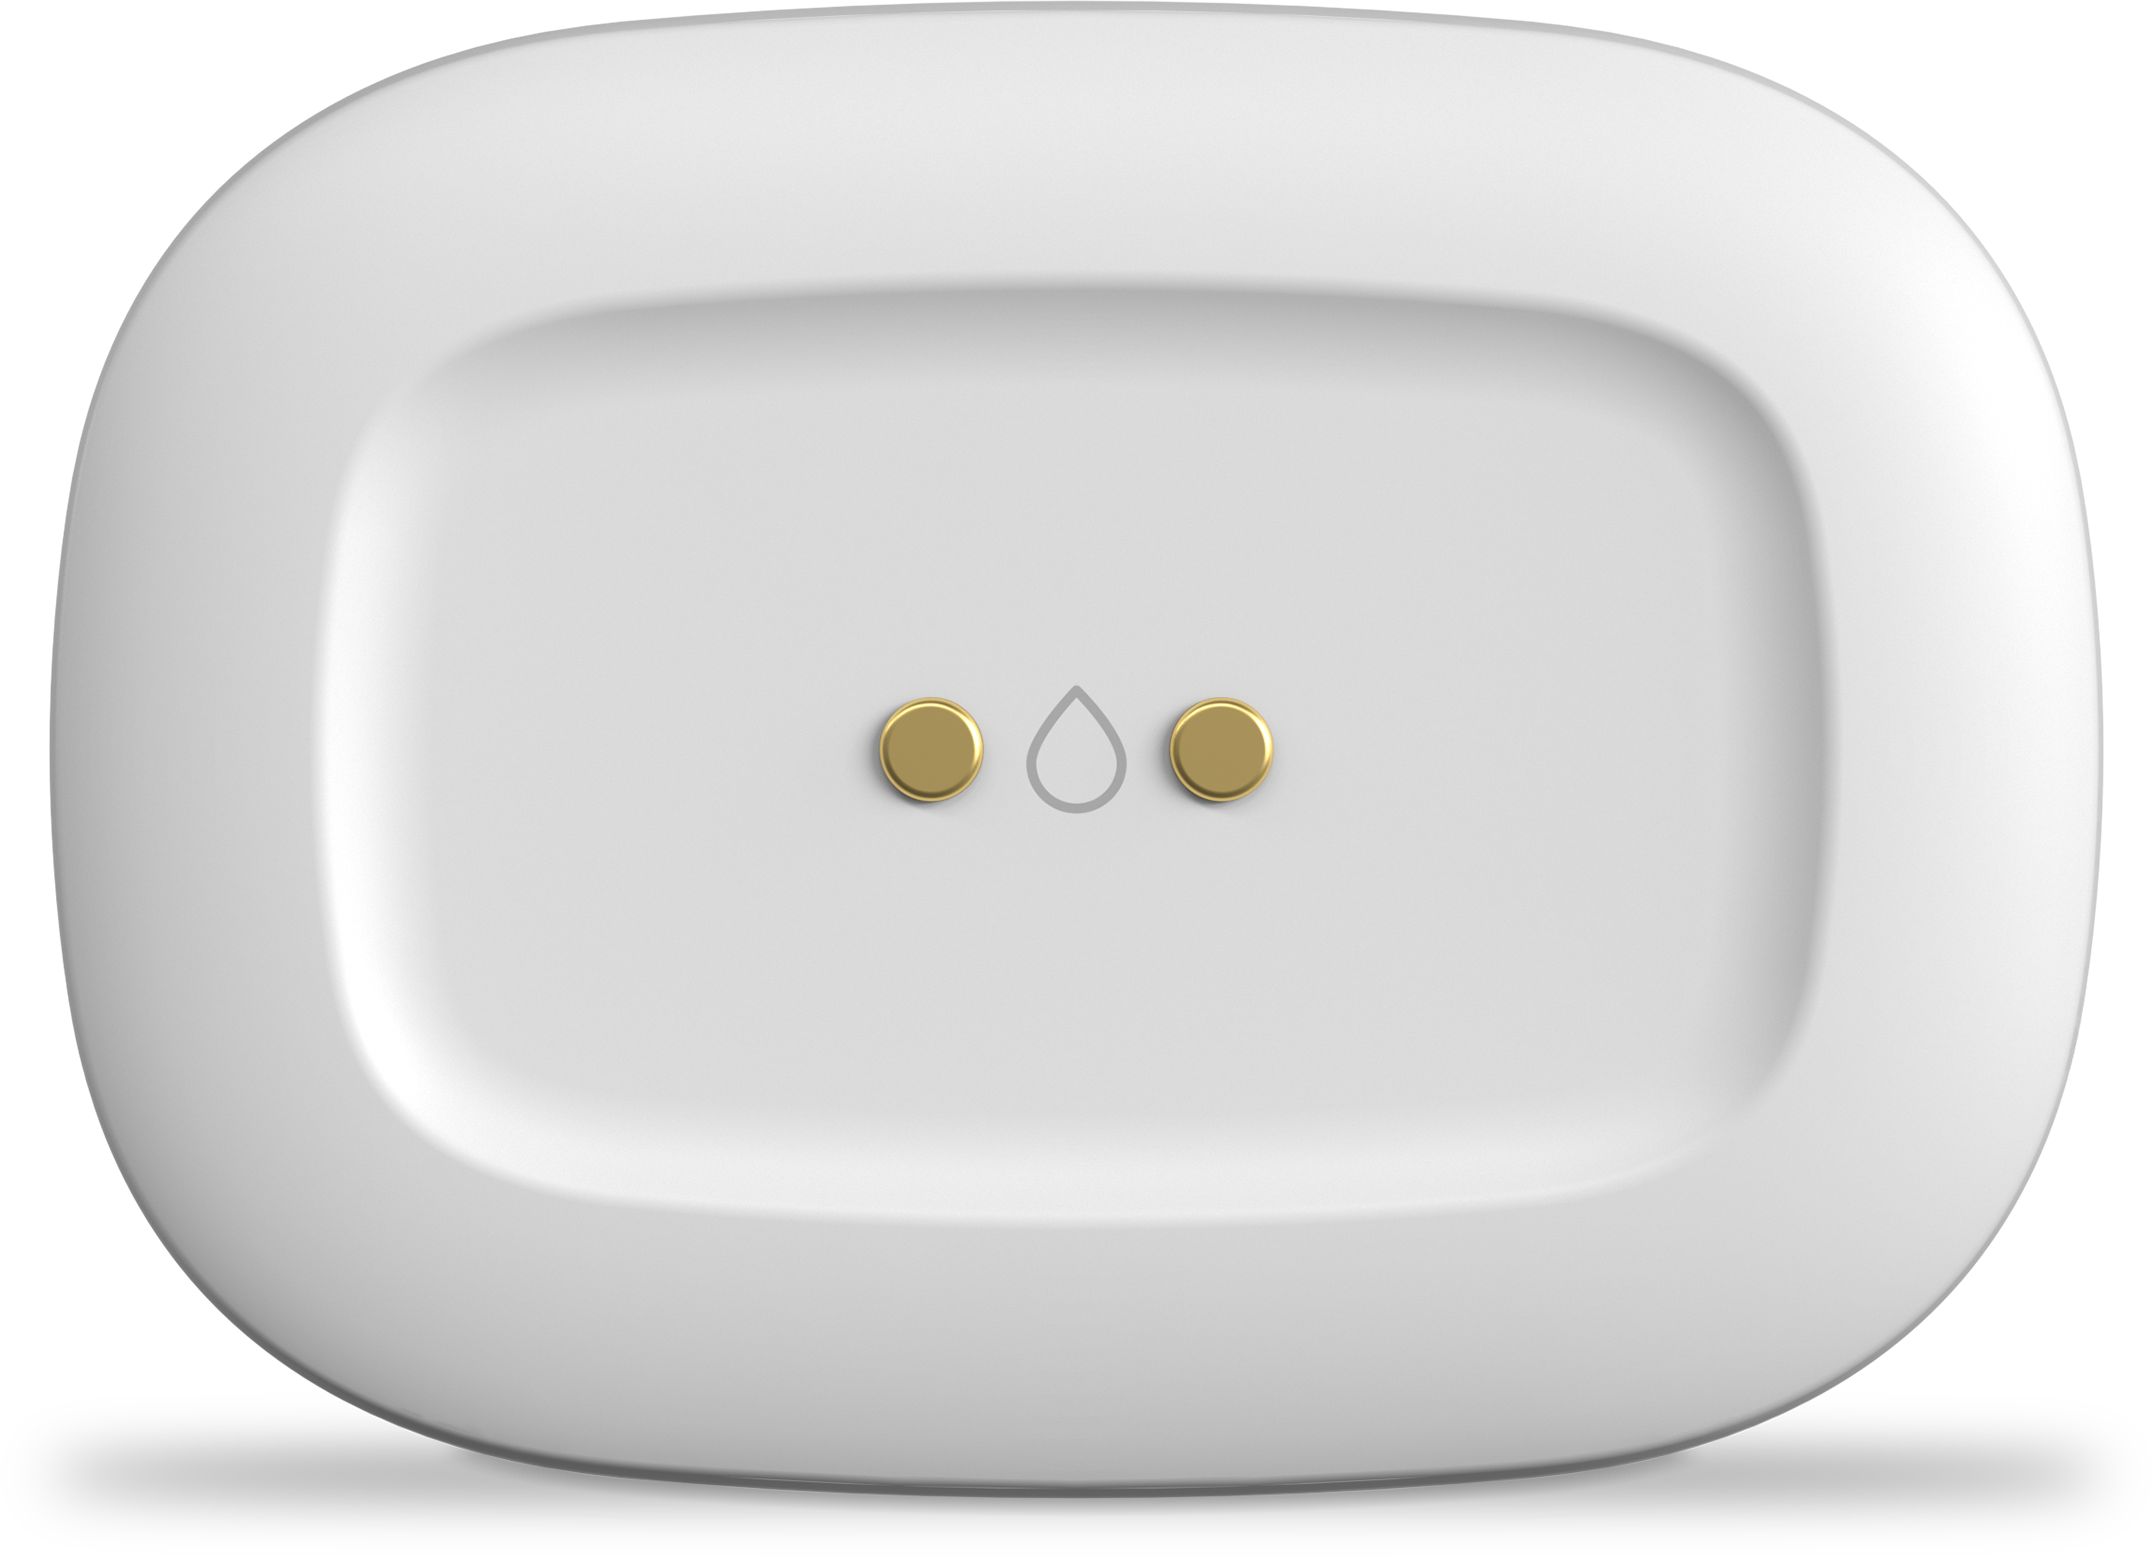 Buy Samsung SmartThings Water Leak Sensor - Microsoft Store